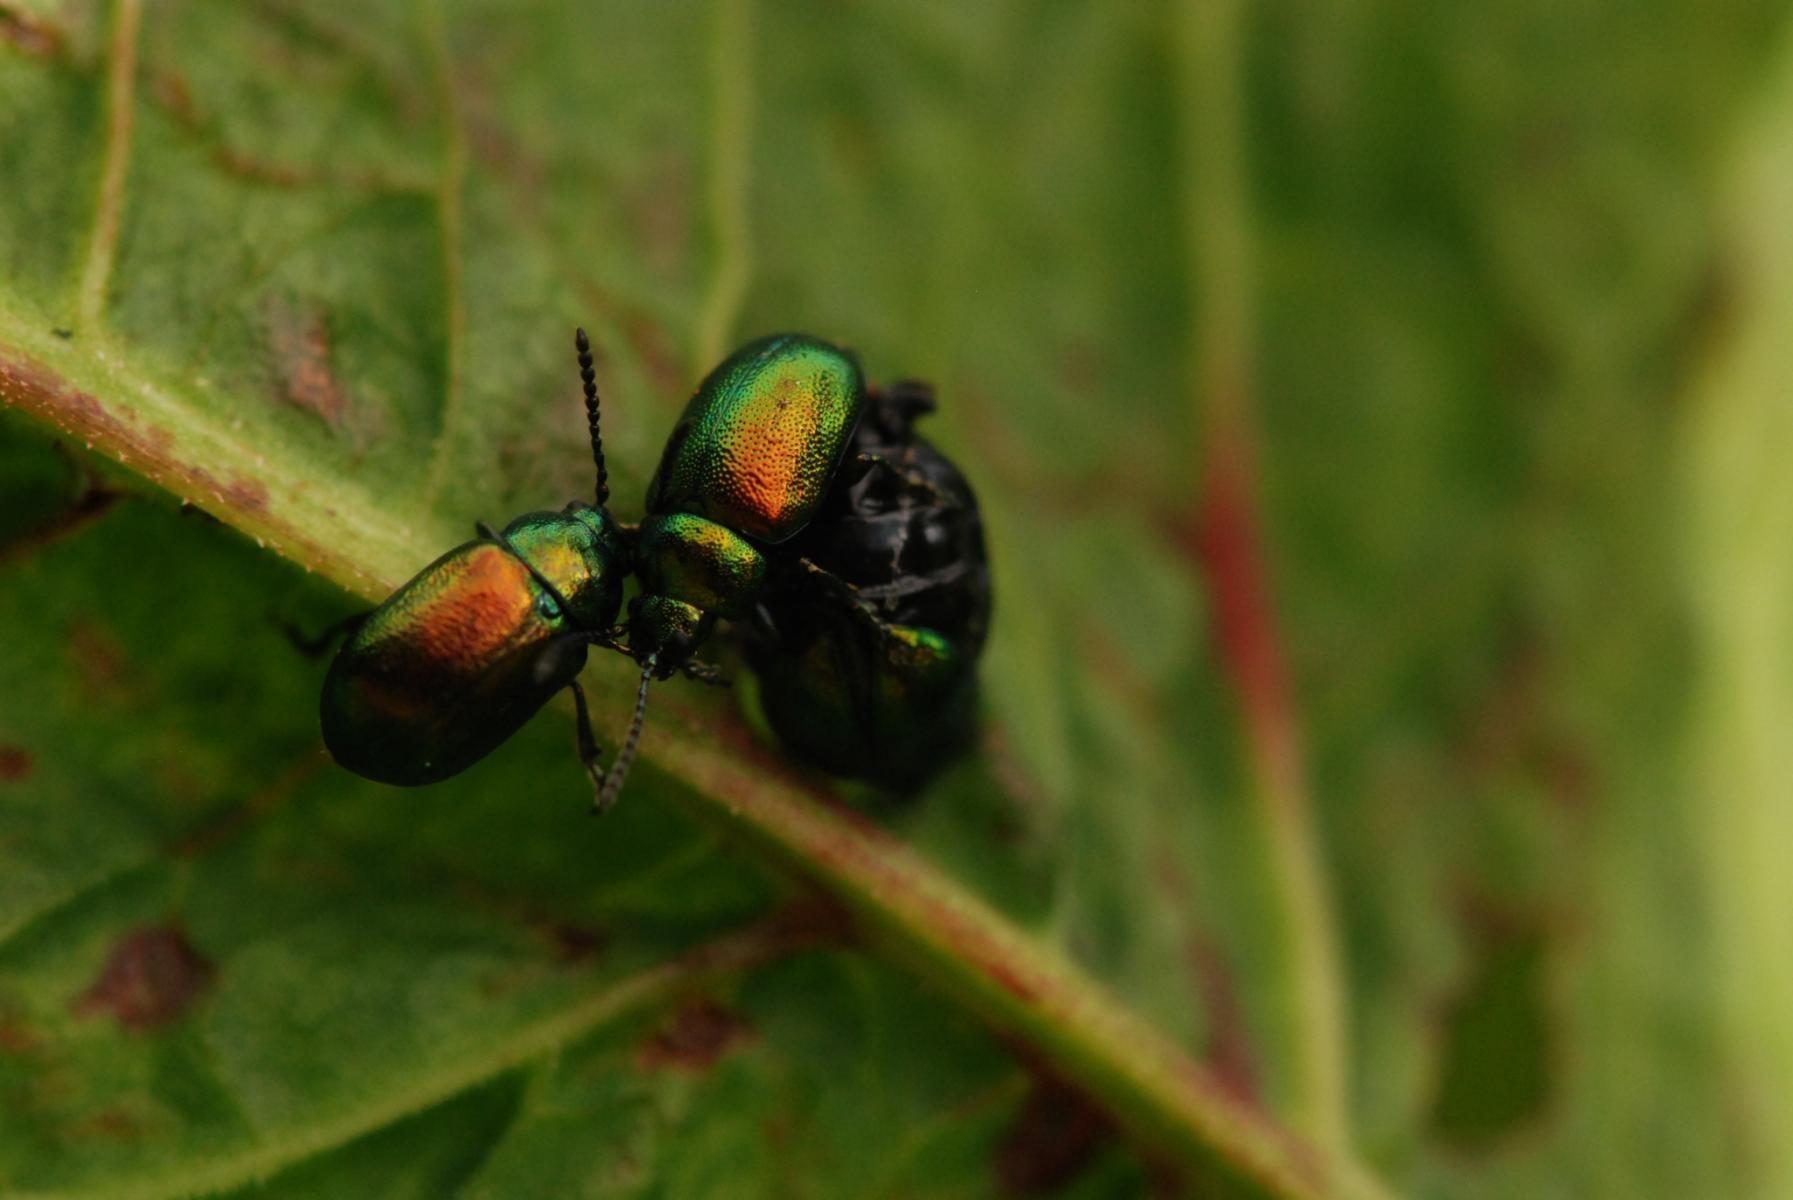 Gastrophysa viridula - Leaf Beetle